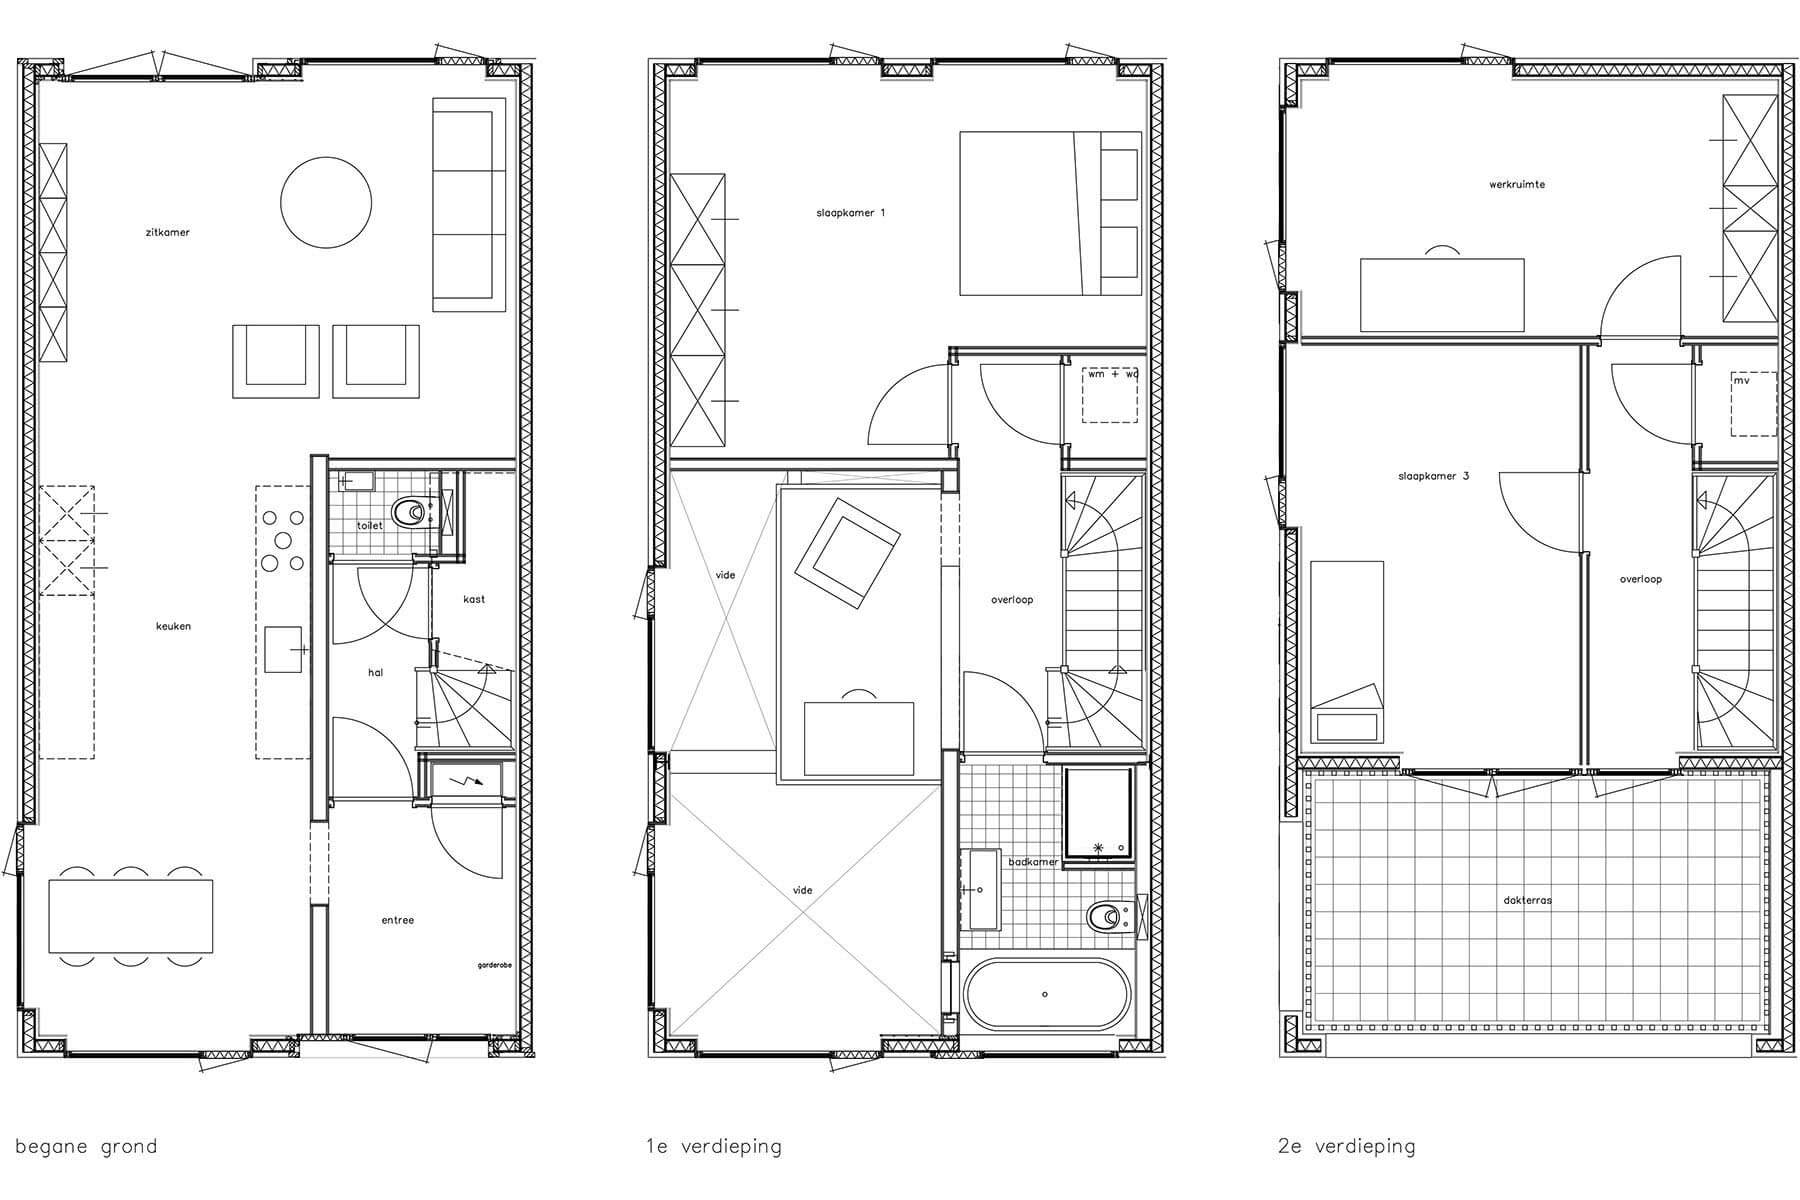 8A Architecten - Zelfbouw hoekwoning Window house, Homeruskwartier, Almere Poort